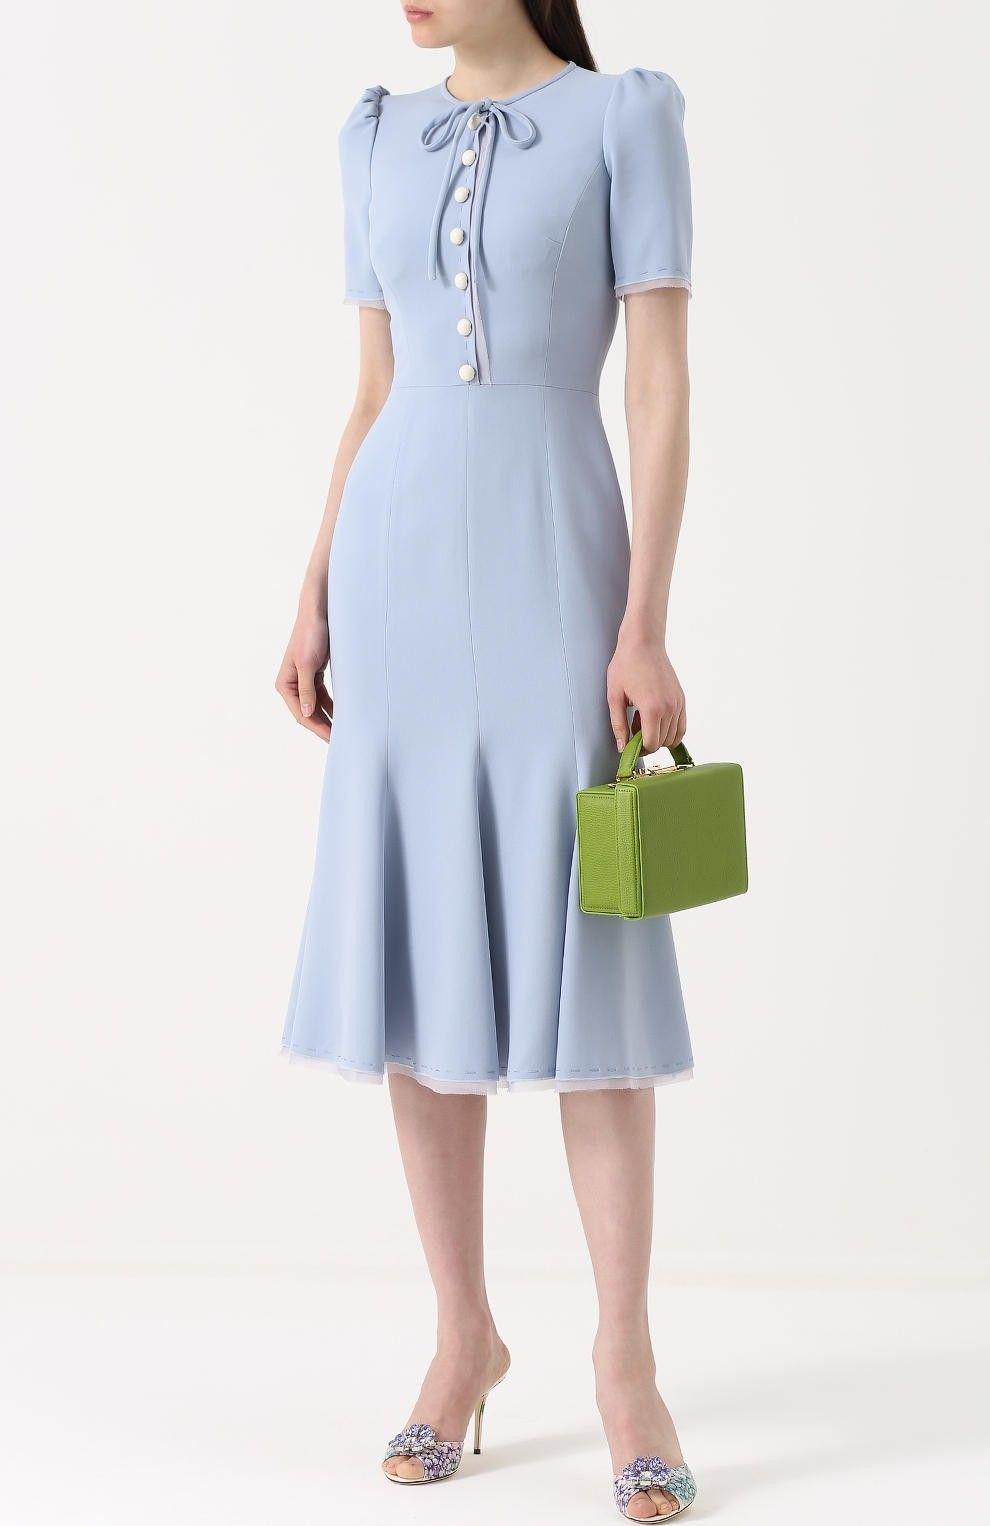 Vestido festa classy chic in pinterest dresses fashion